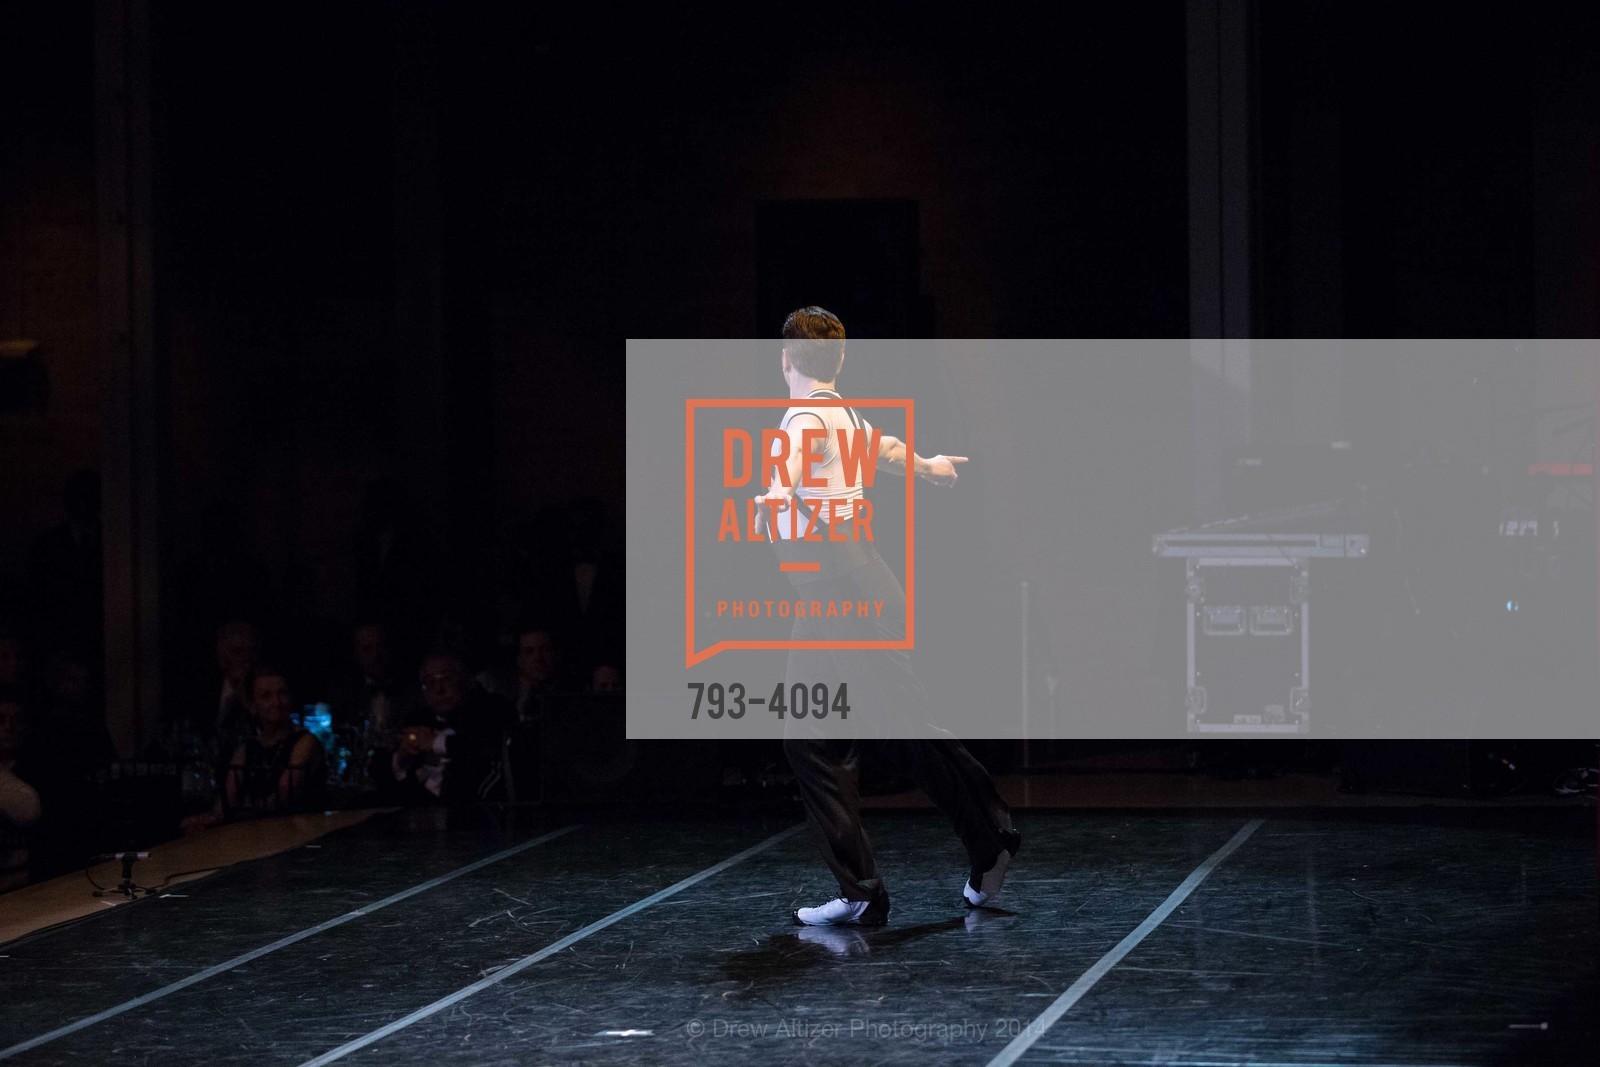 Performance, Photo #793-4094